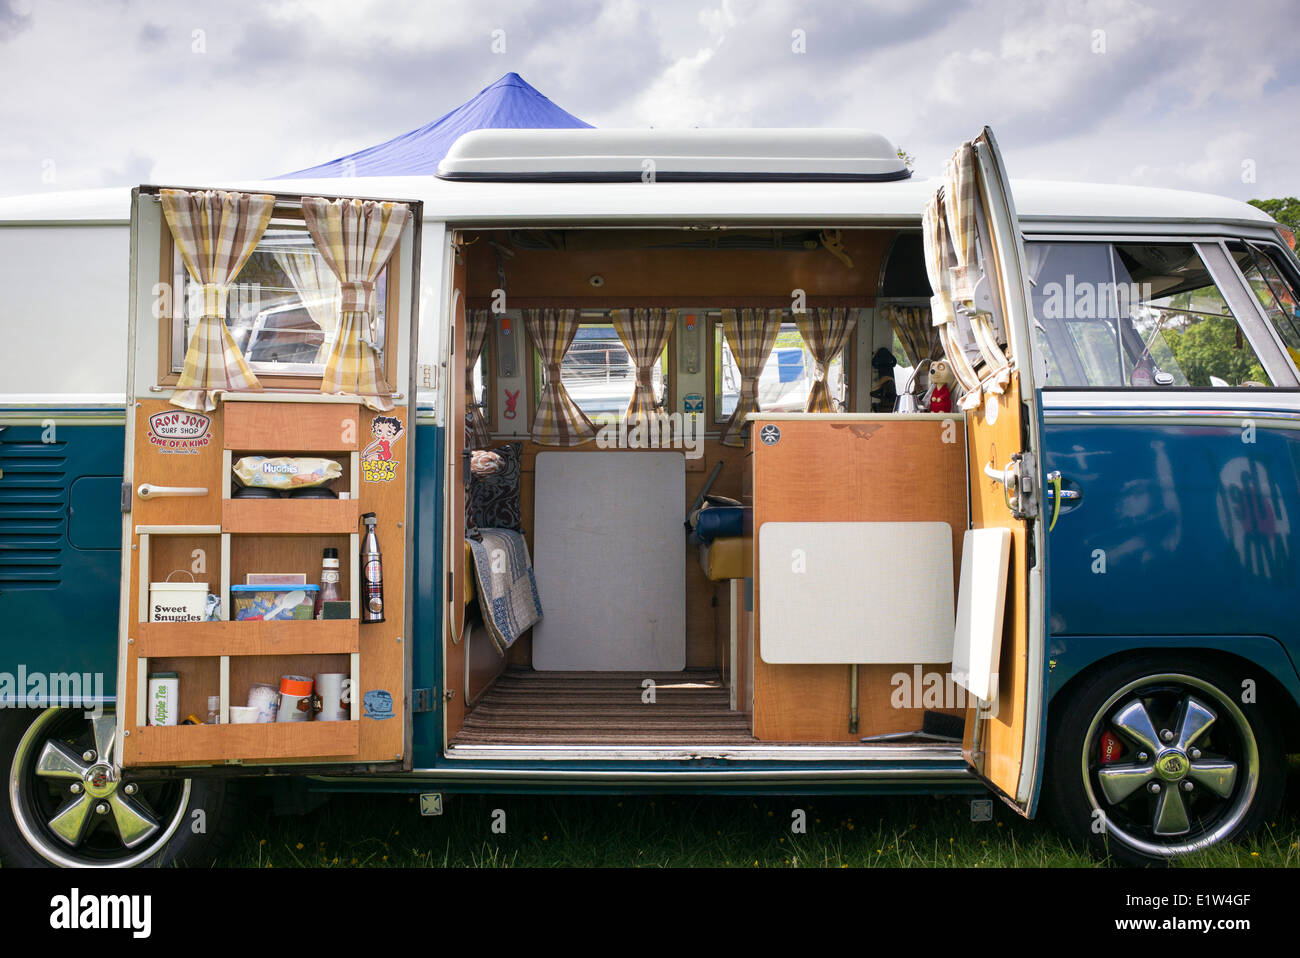 Charmant VW Split Screen Volkswagen Camper Van Interior At A VW Show. England    Stock Image